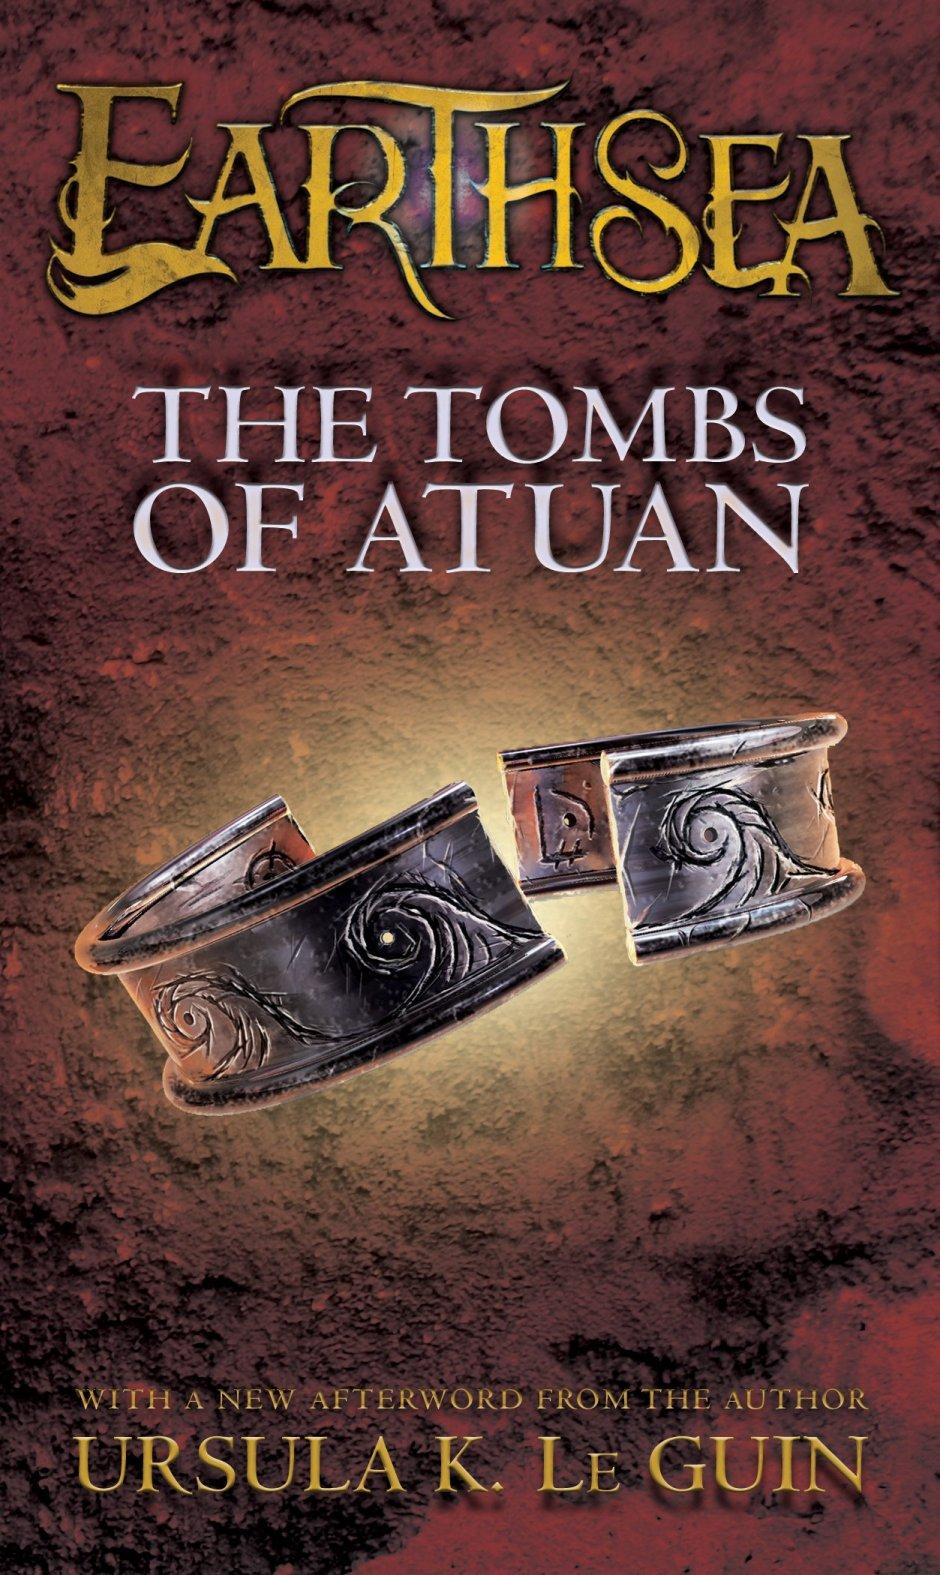 Ursula K. Le Guin, Earthsea Cycle II - The Tombs of Atuan (Aladdin Paperbacks).jpg